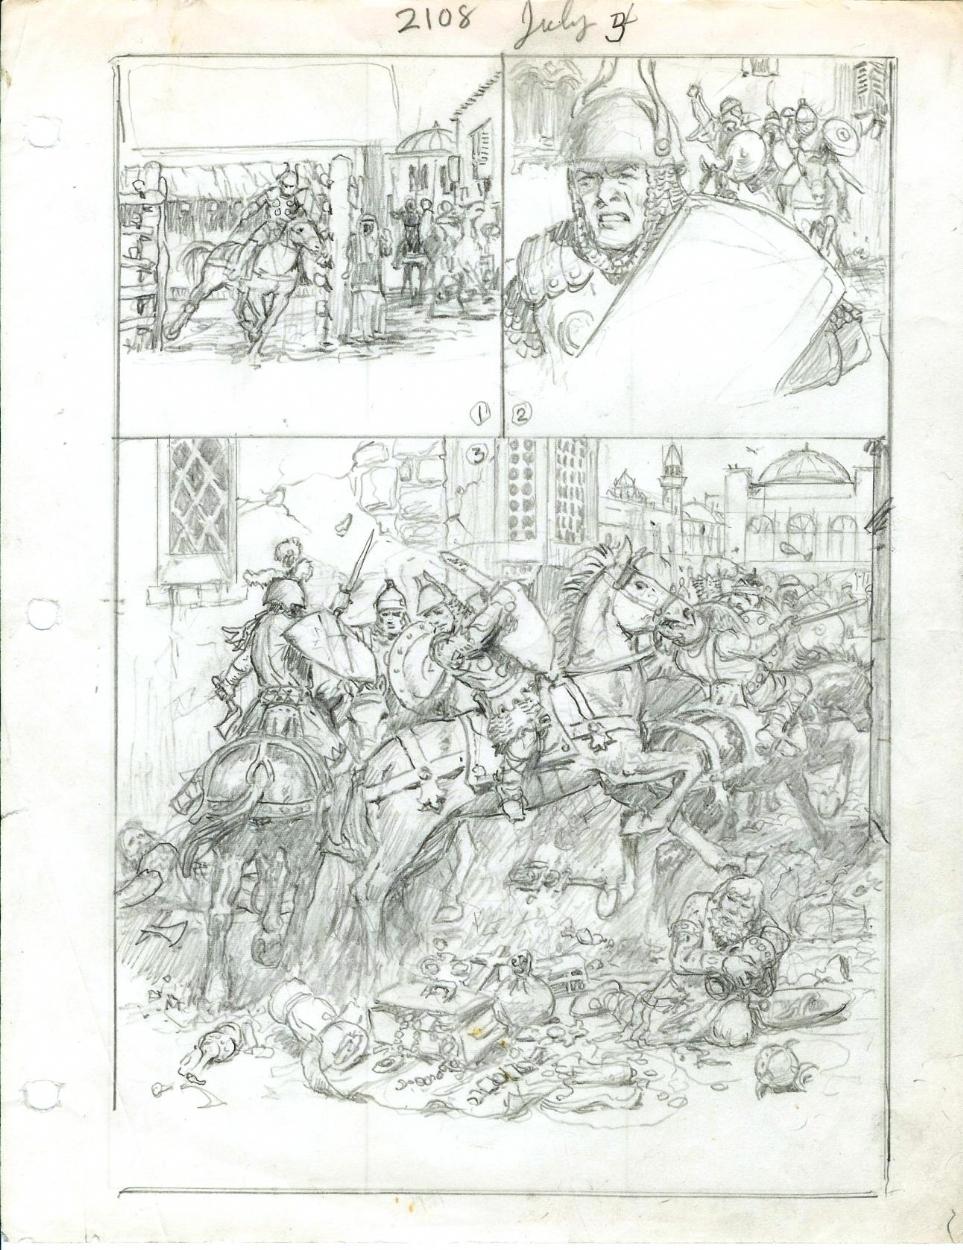 Hal Foster - Prince Valiant 2108, preliminary.  Comic Art